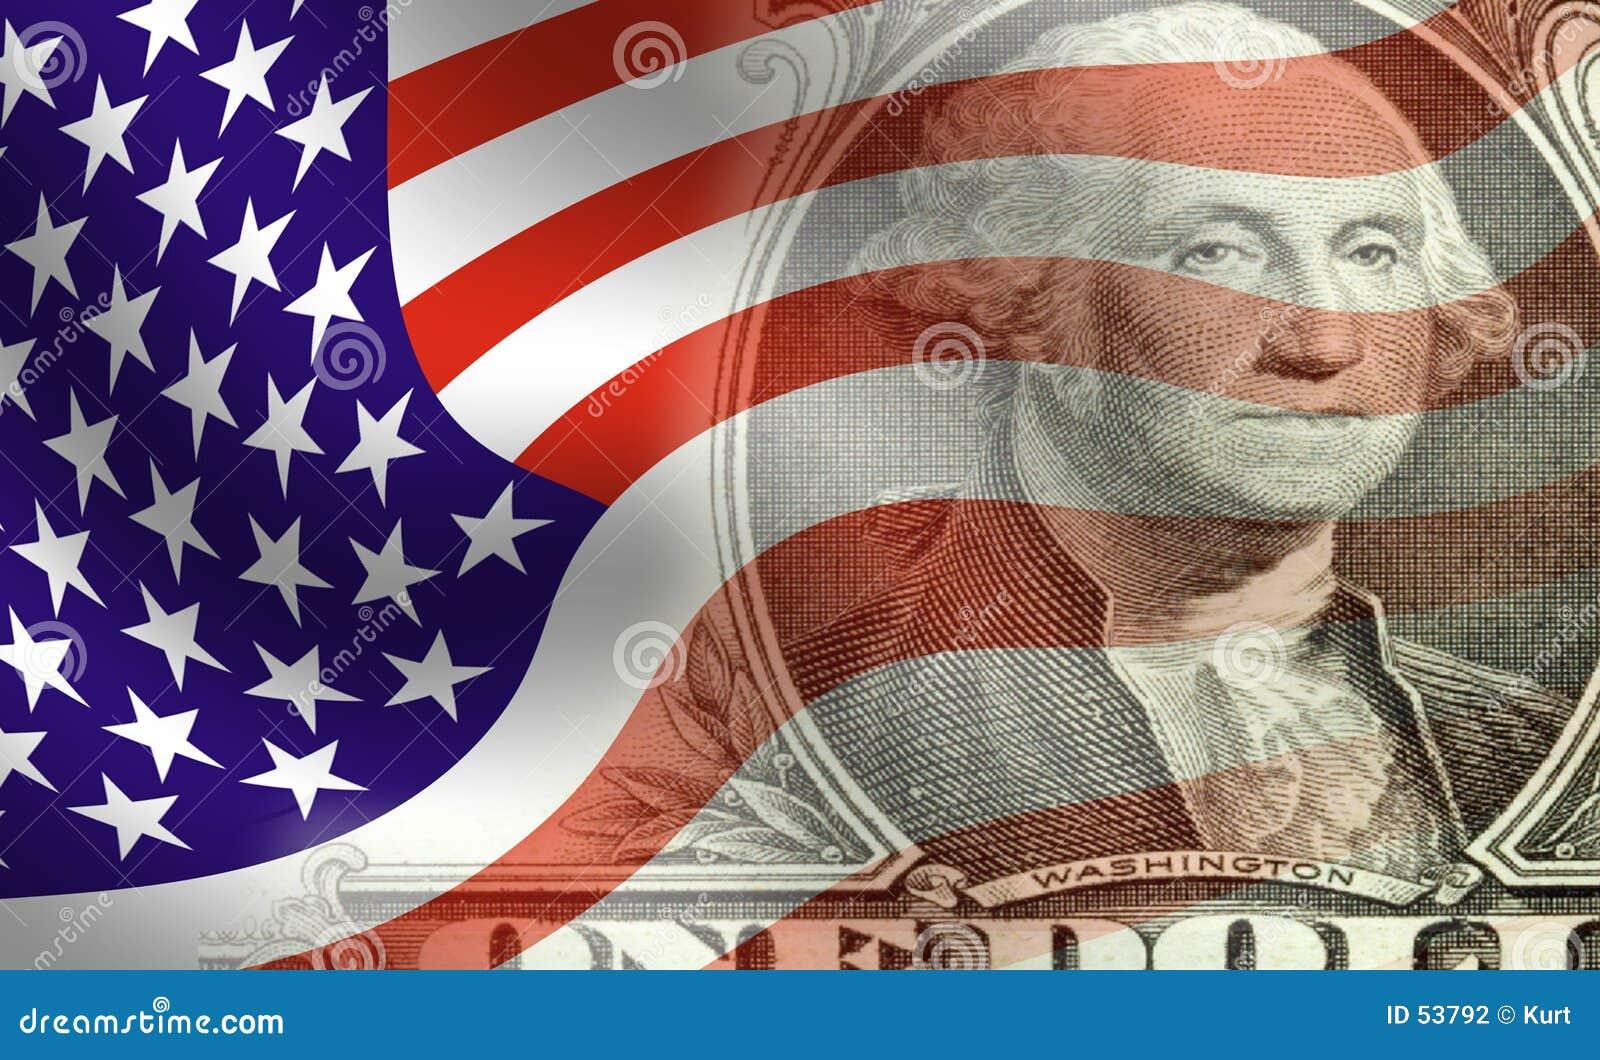 Washington infront van vlag